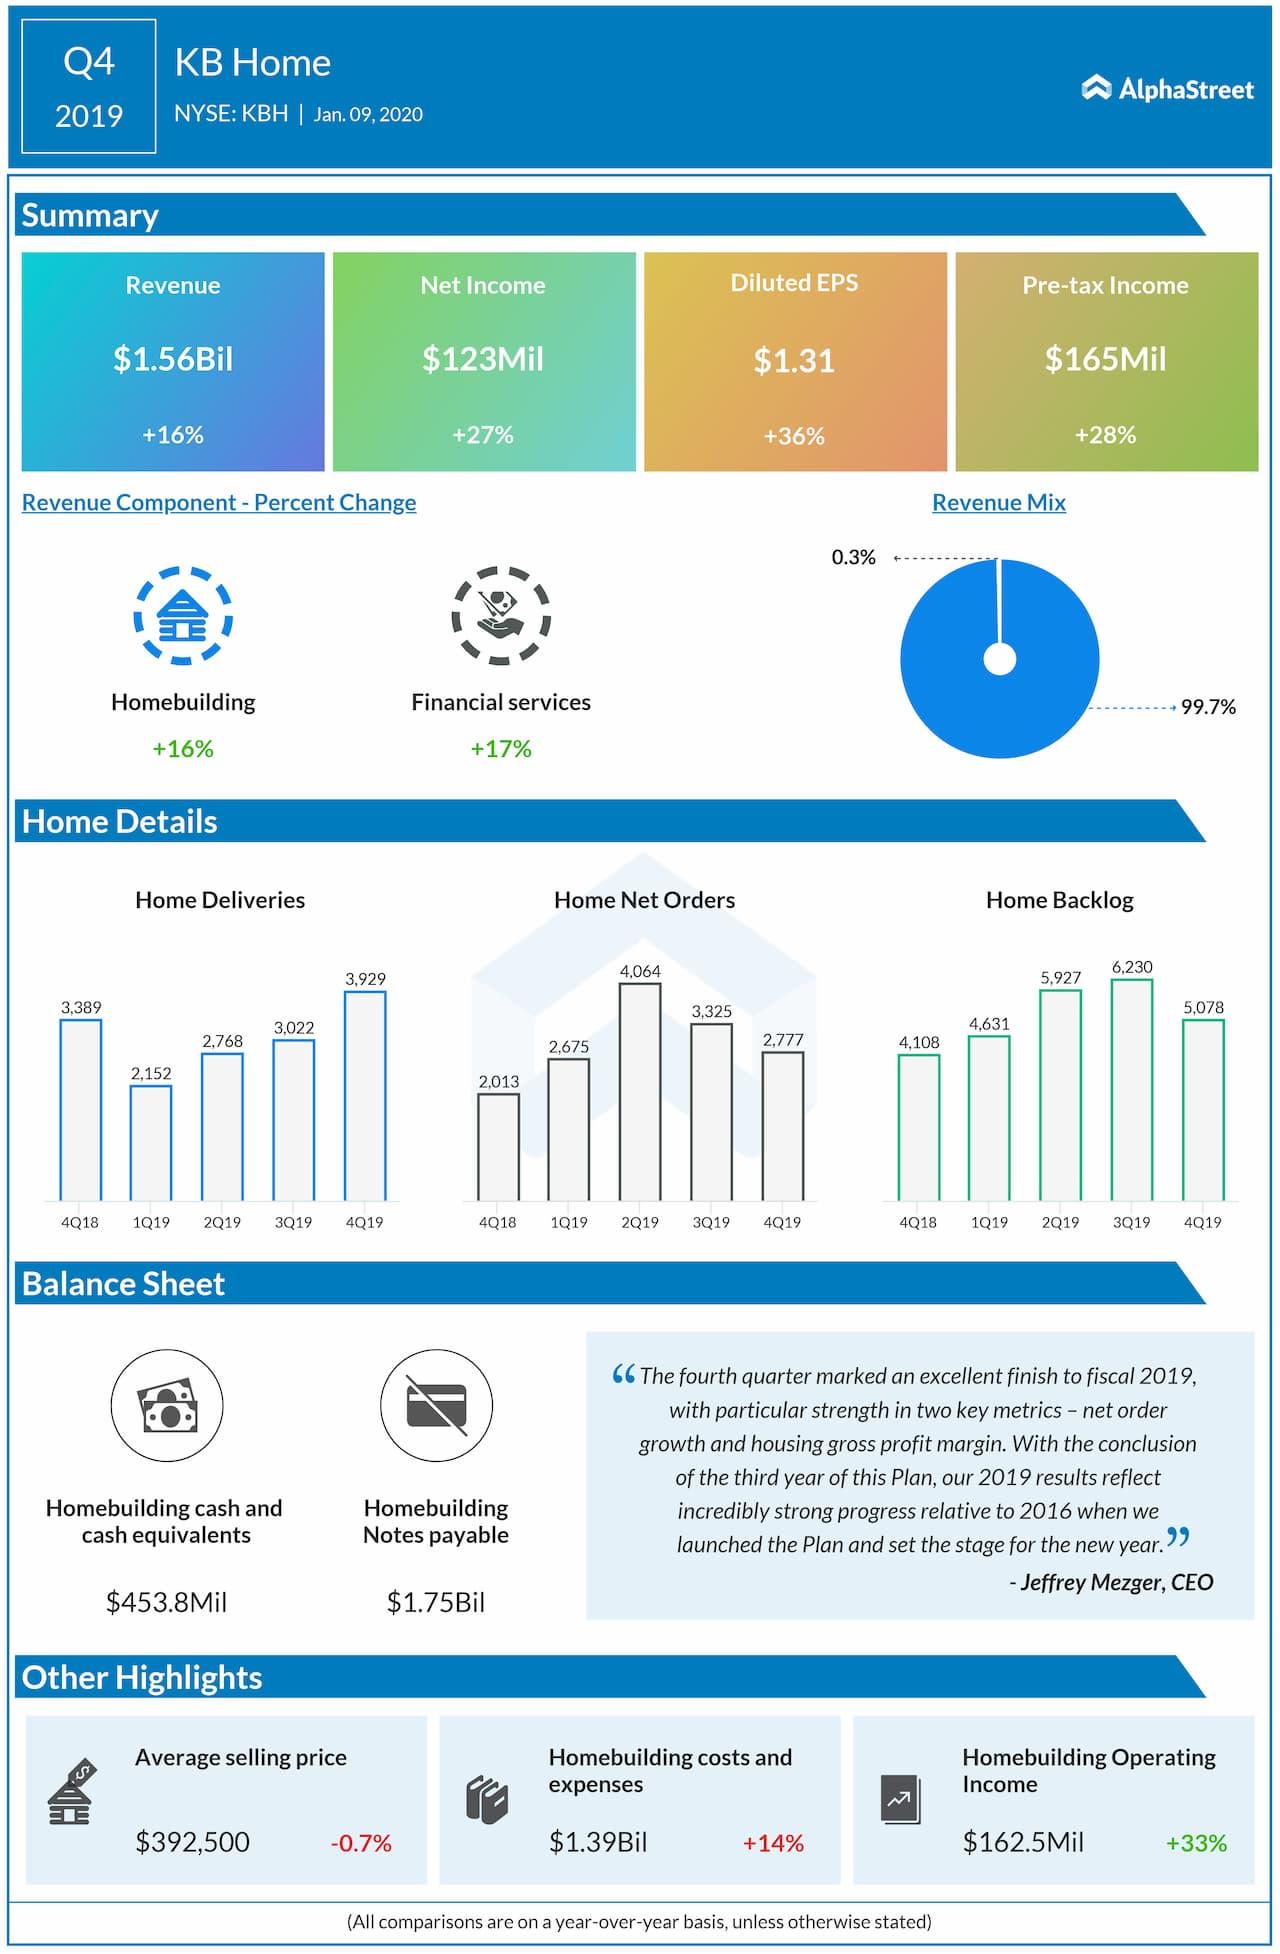 KB Home (KBH) Q4 2019 earnings review